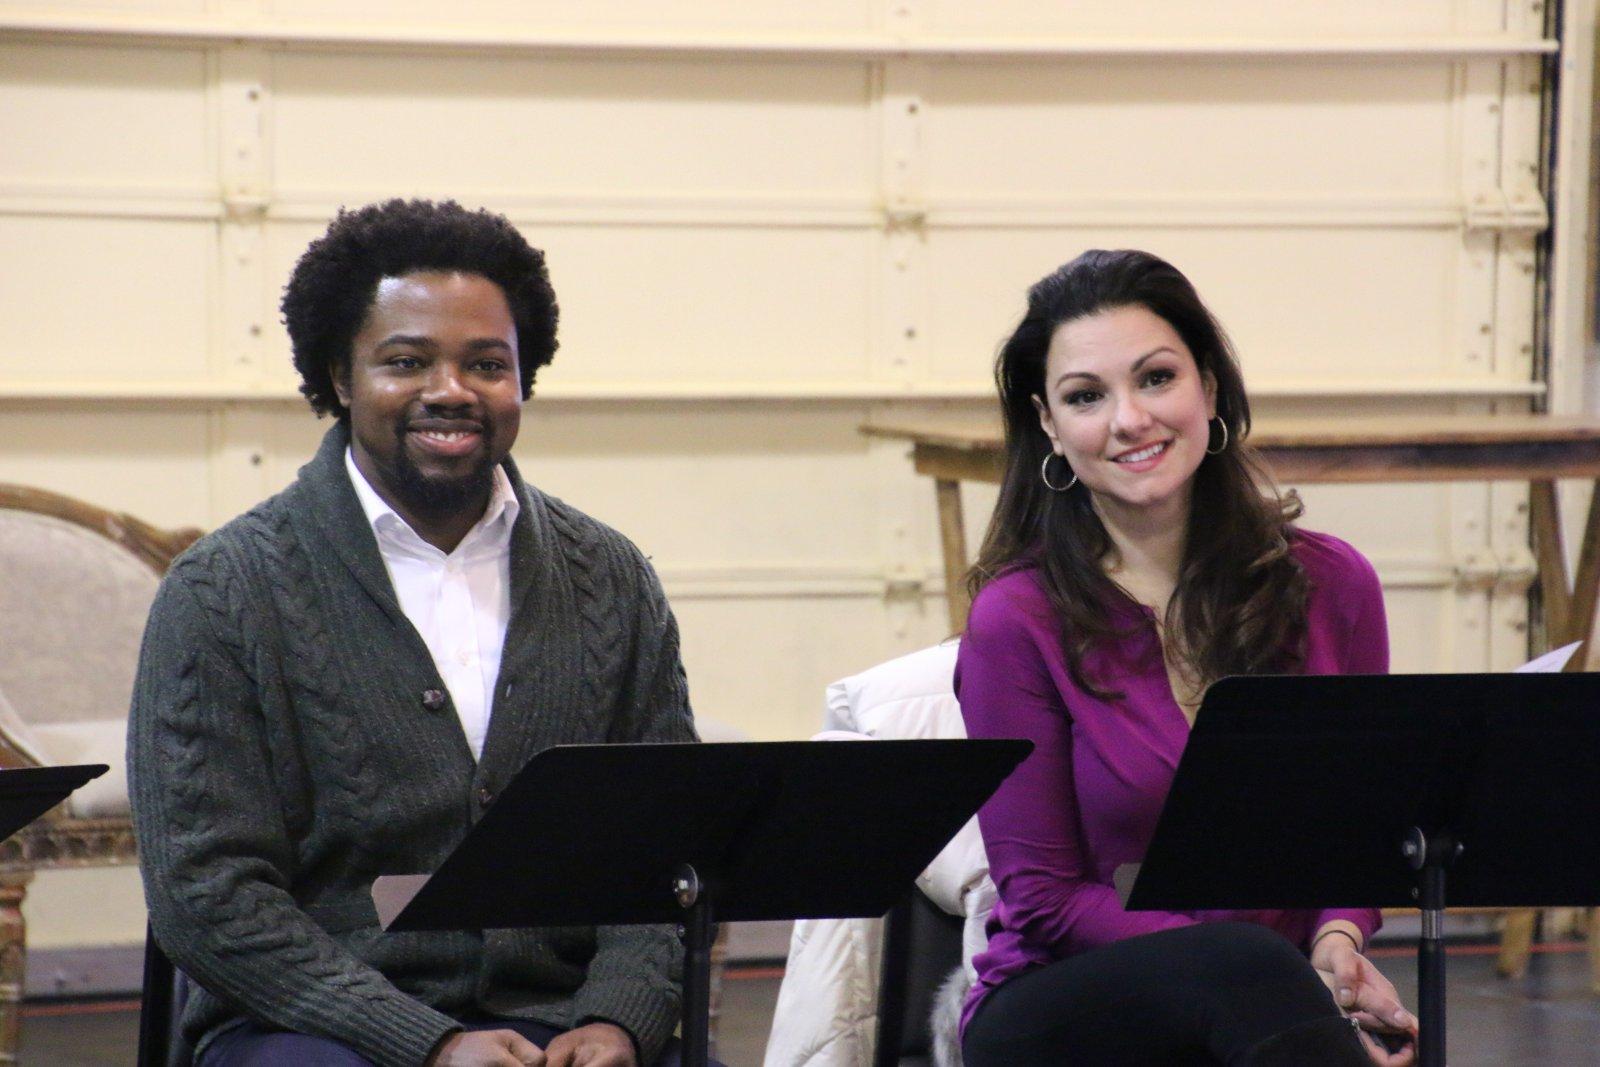 Leroy Y. Davis and Sandra Eddy